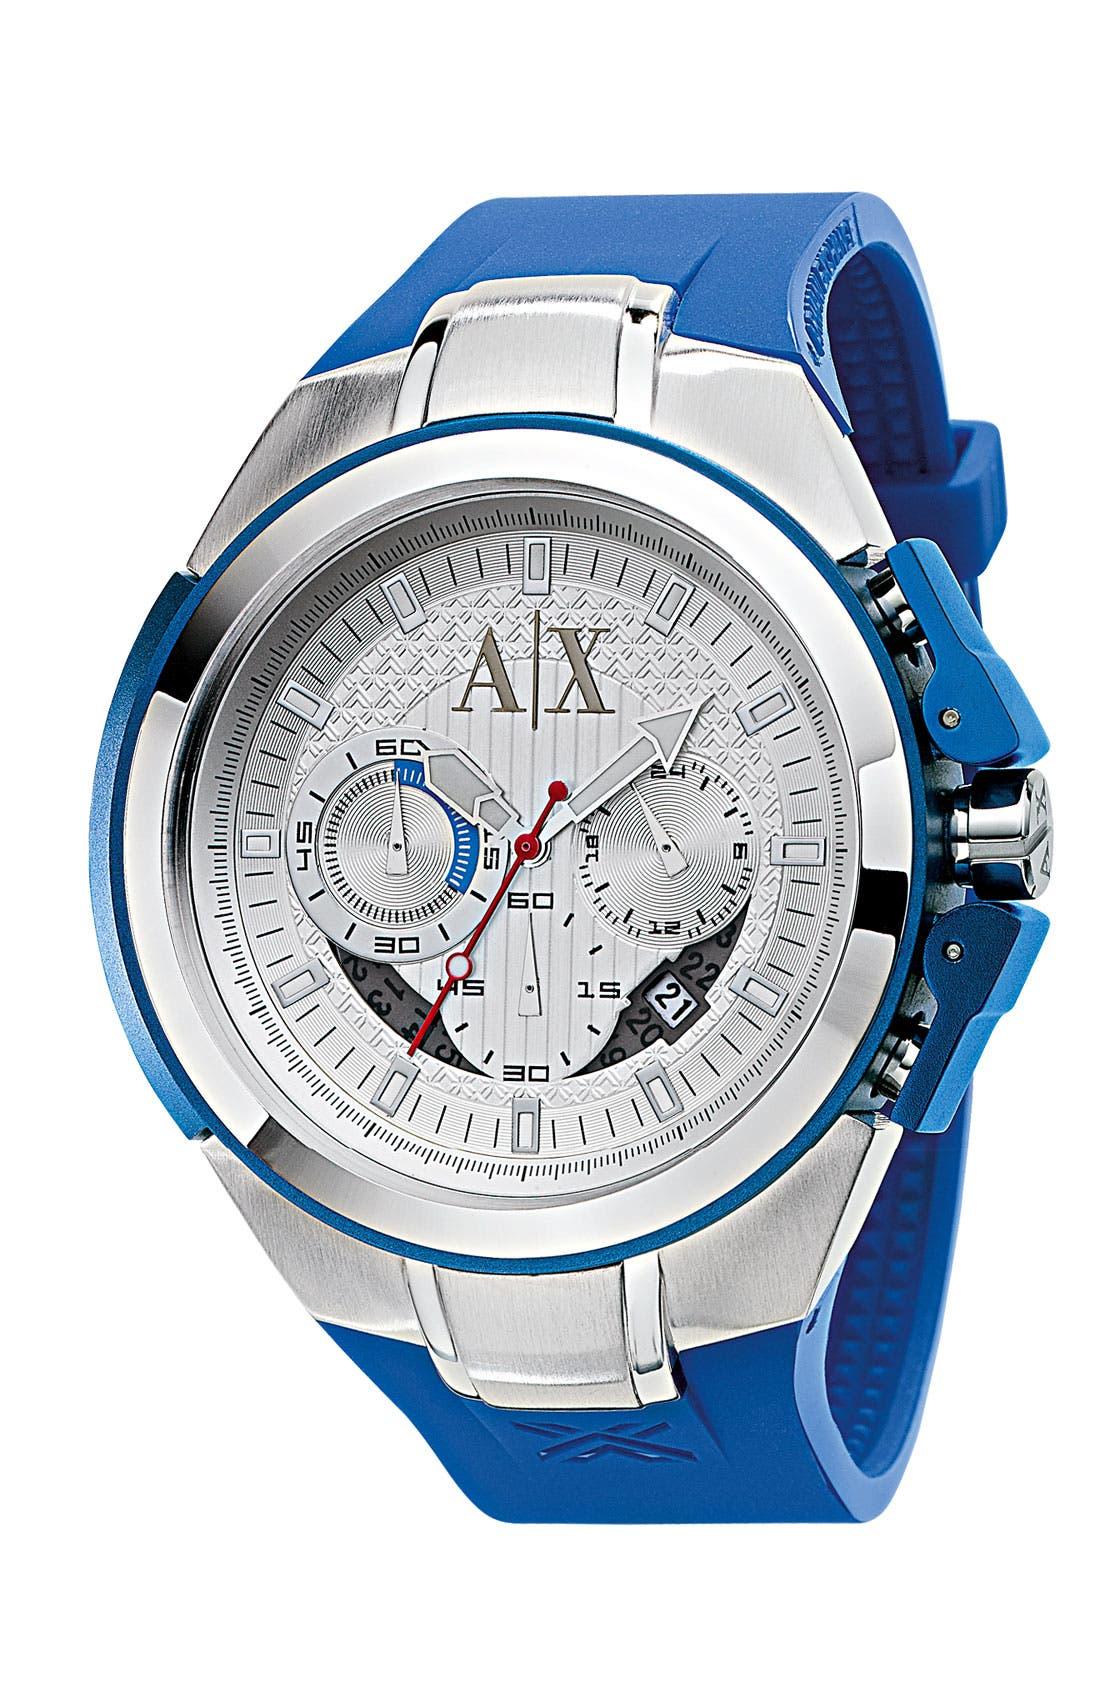 Main Image - AX Armani Exchange Men's Chronograph Watch, 38mm